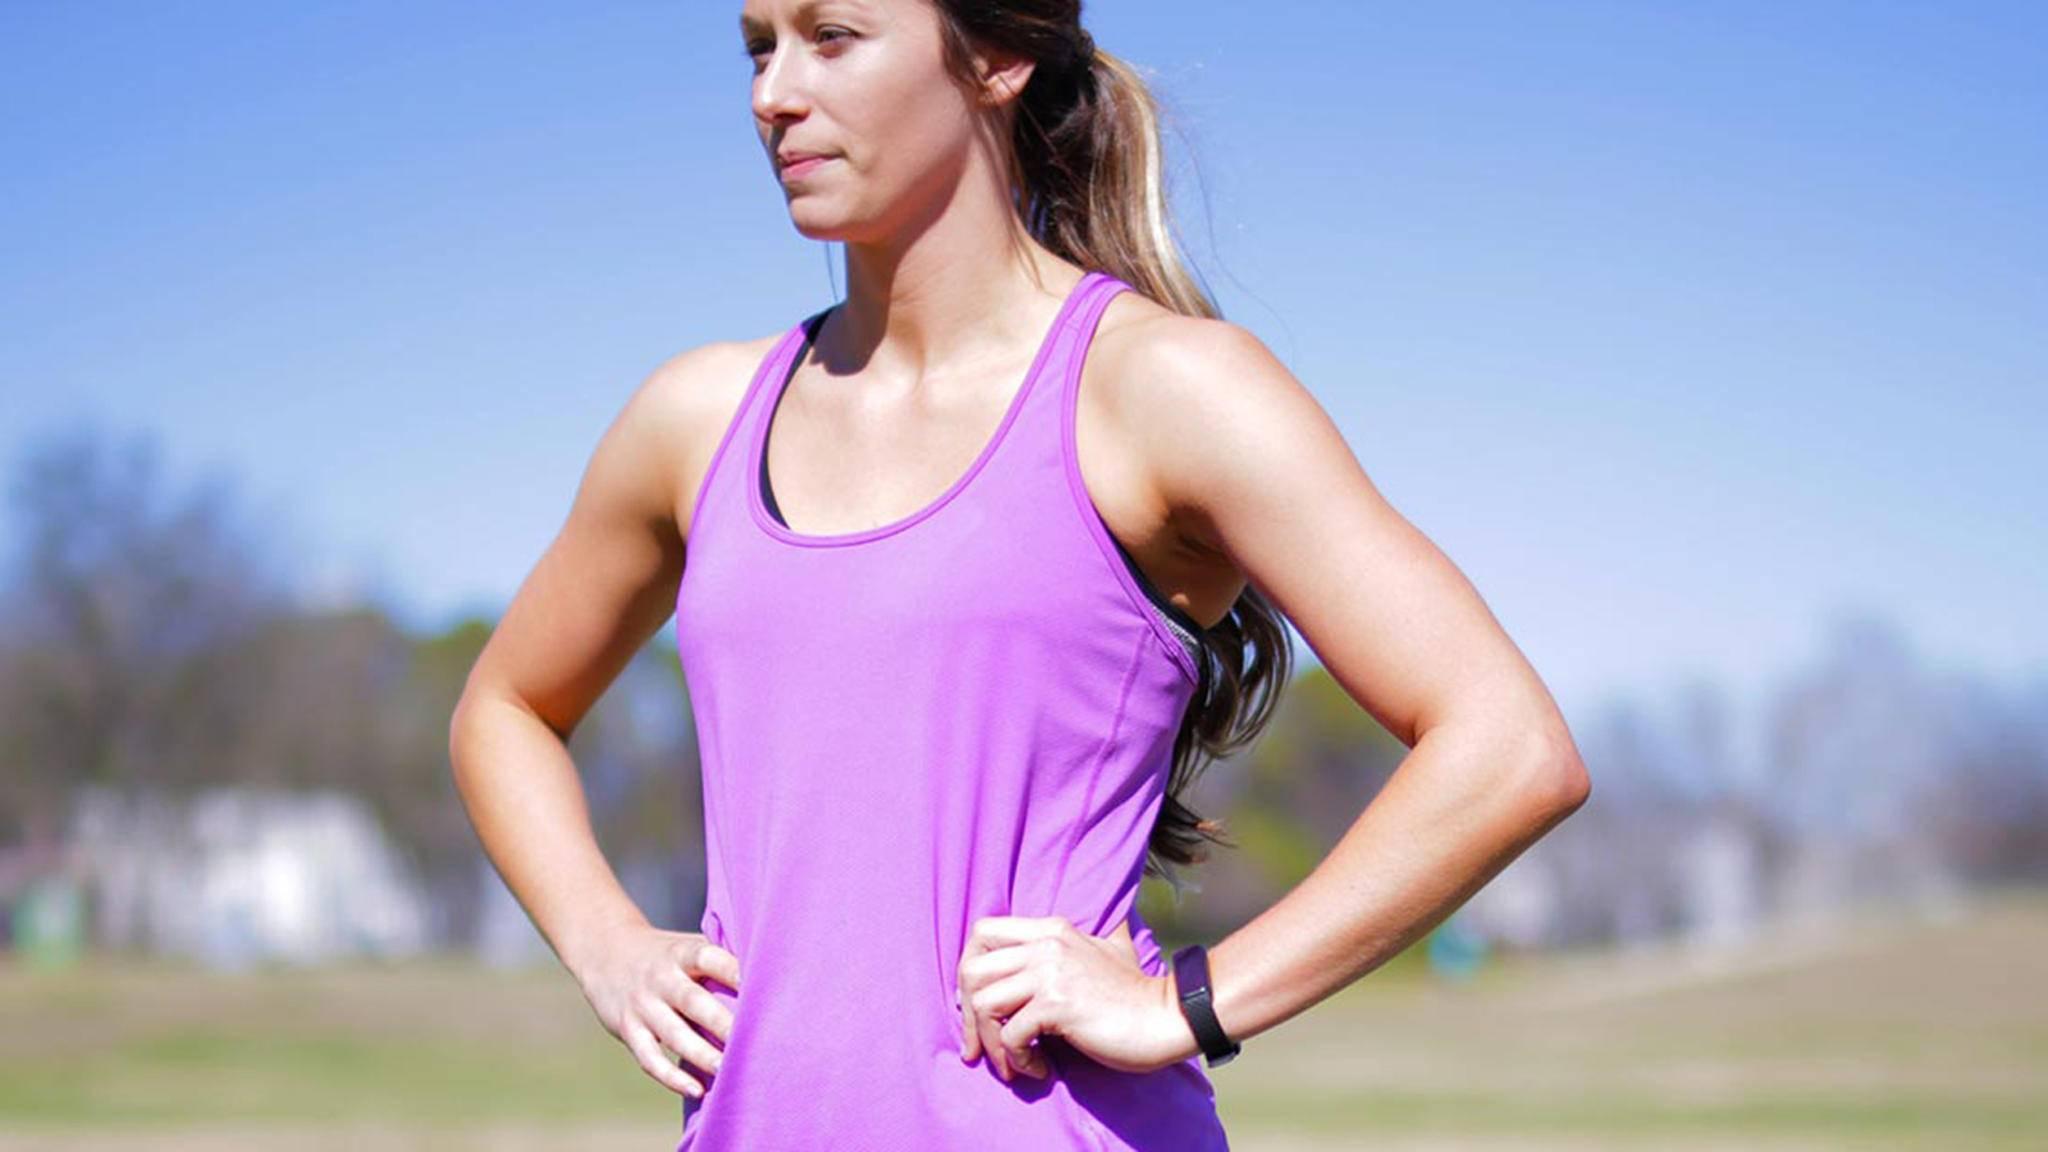 Der Shape Fitness-Tracker